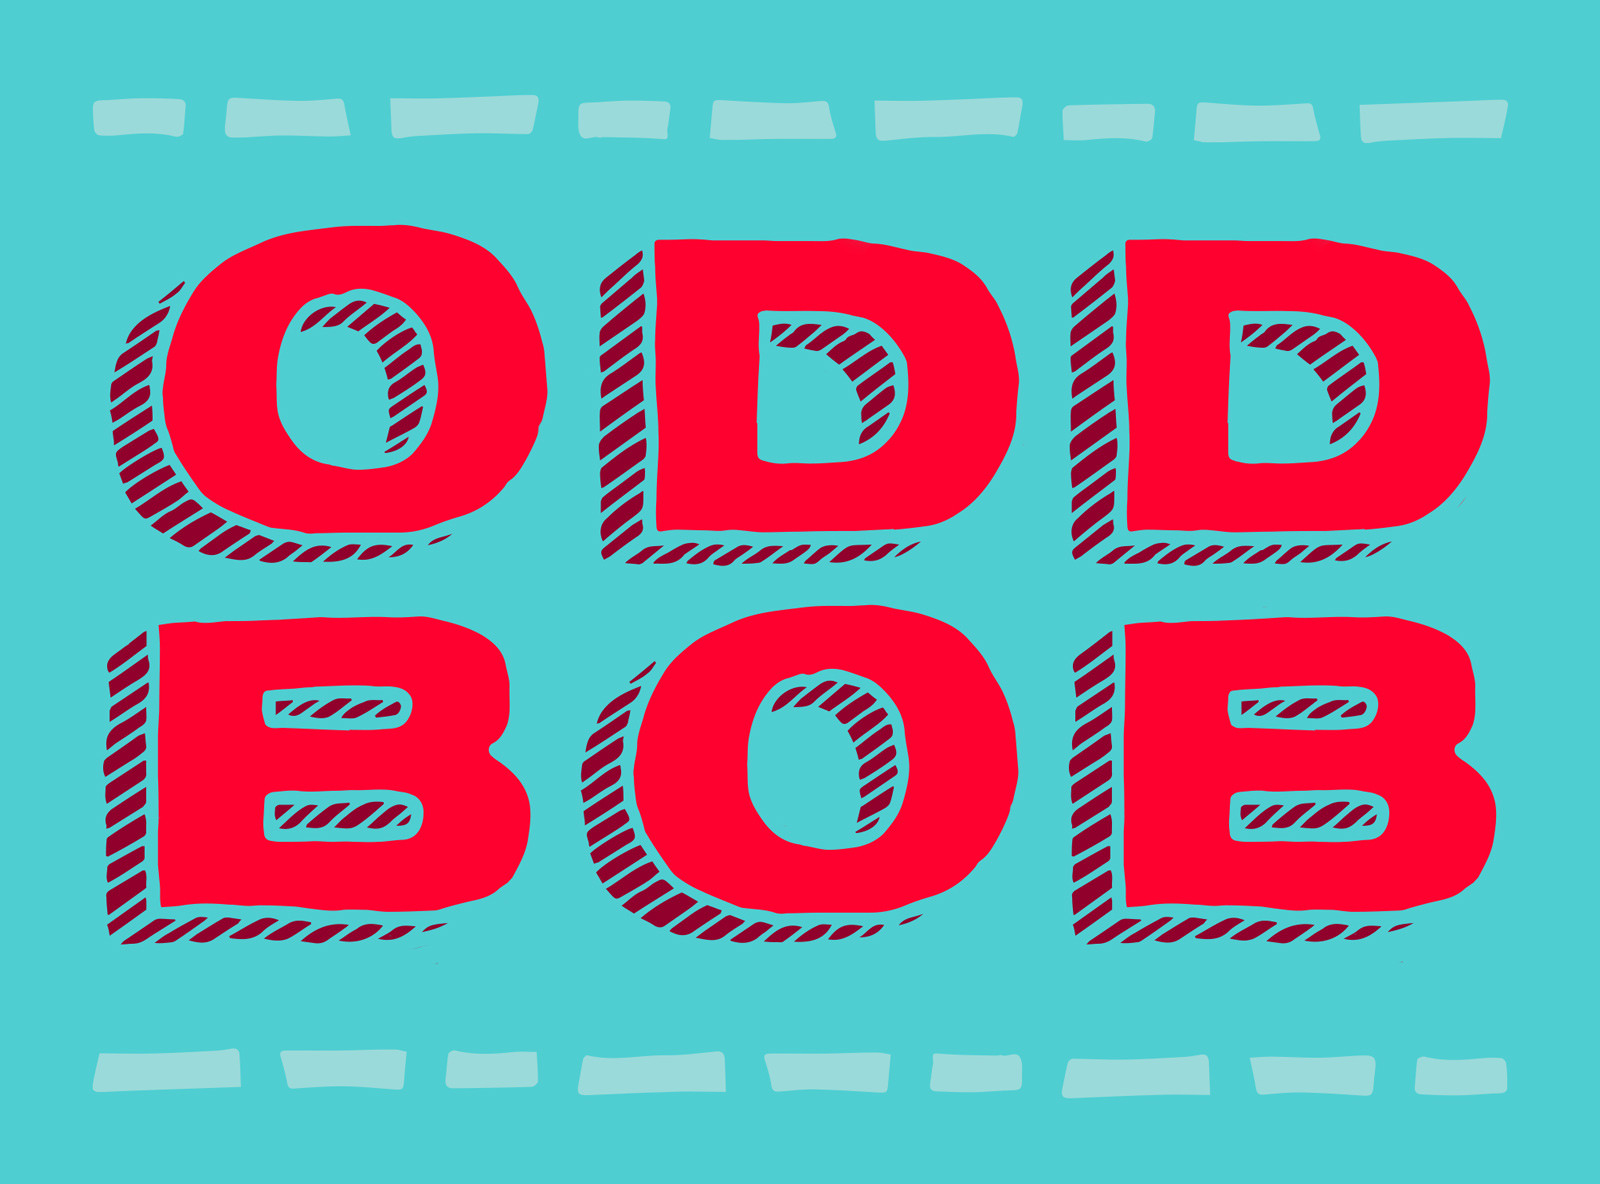 odd-bob-hand-drawn-font-typeface-martin-